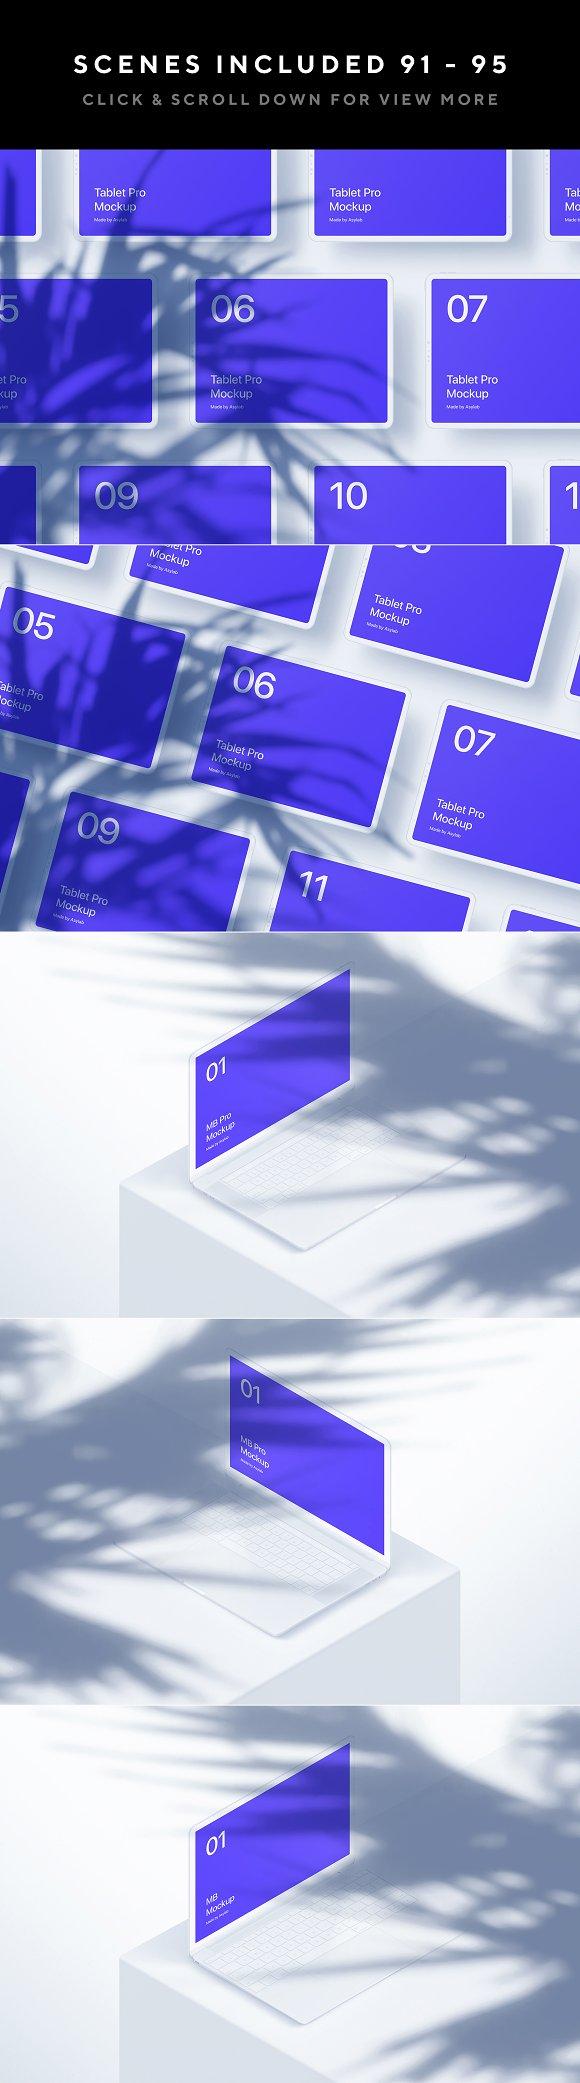 100 Branding Stationery Mockups in Branding Mockups - product preview 39